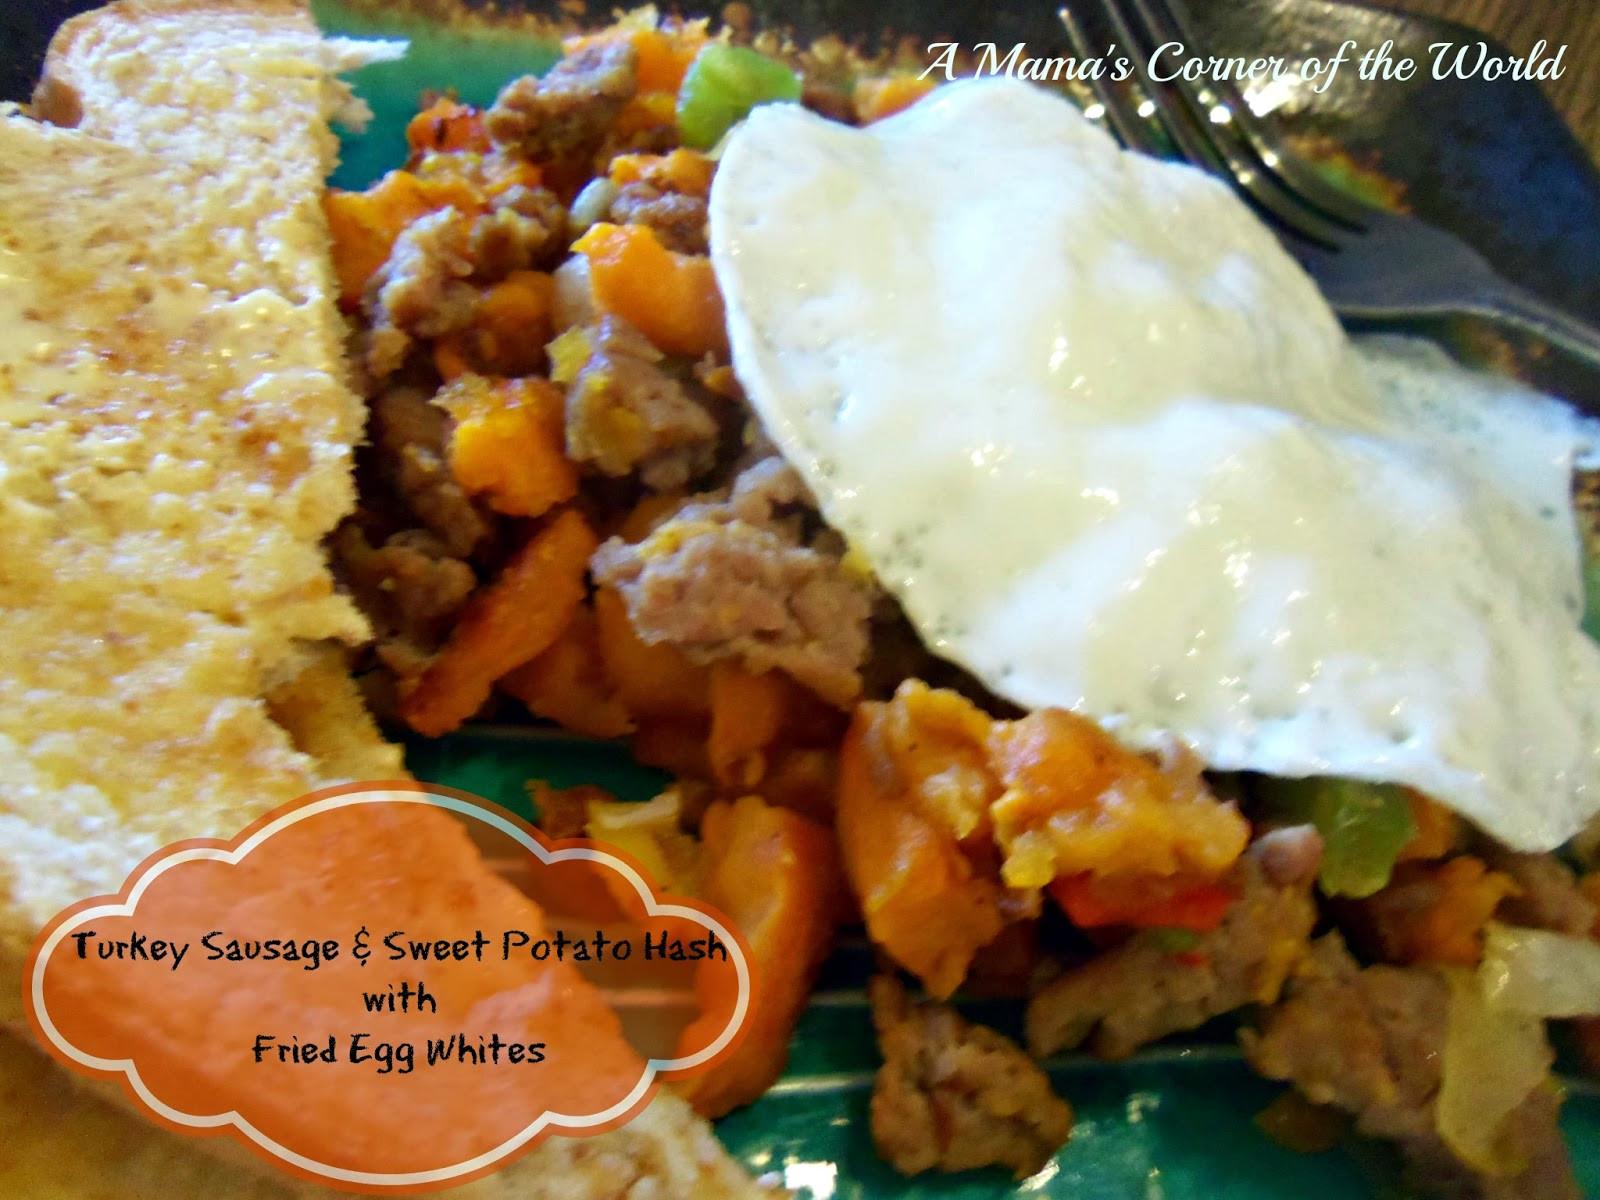 Turkey Sausage Healthy  Healthy Breakfast Recipe Turkey Sausage and Sweet Potato